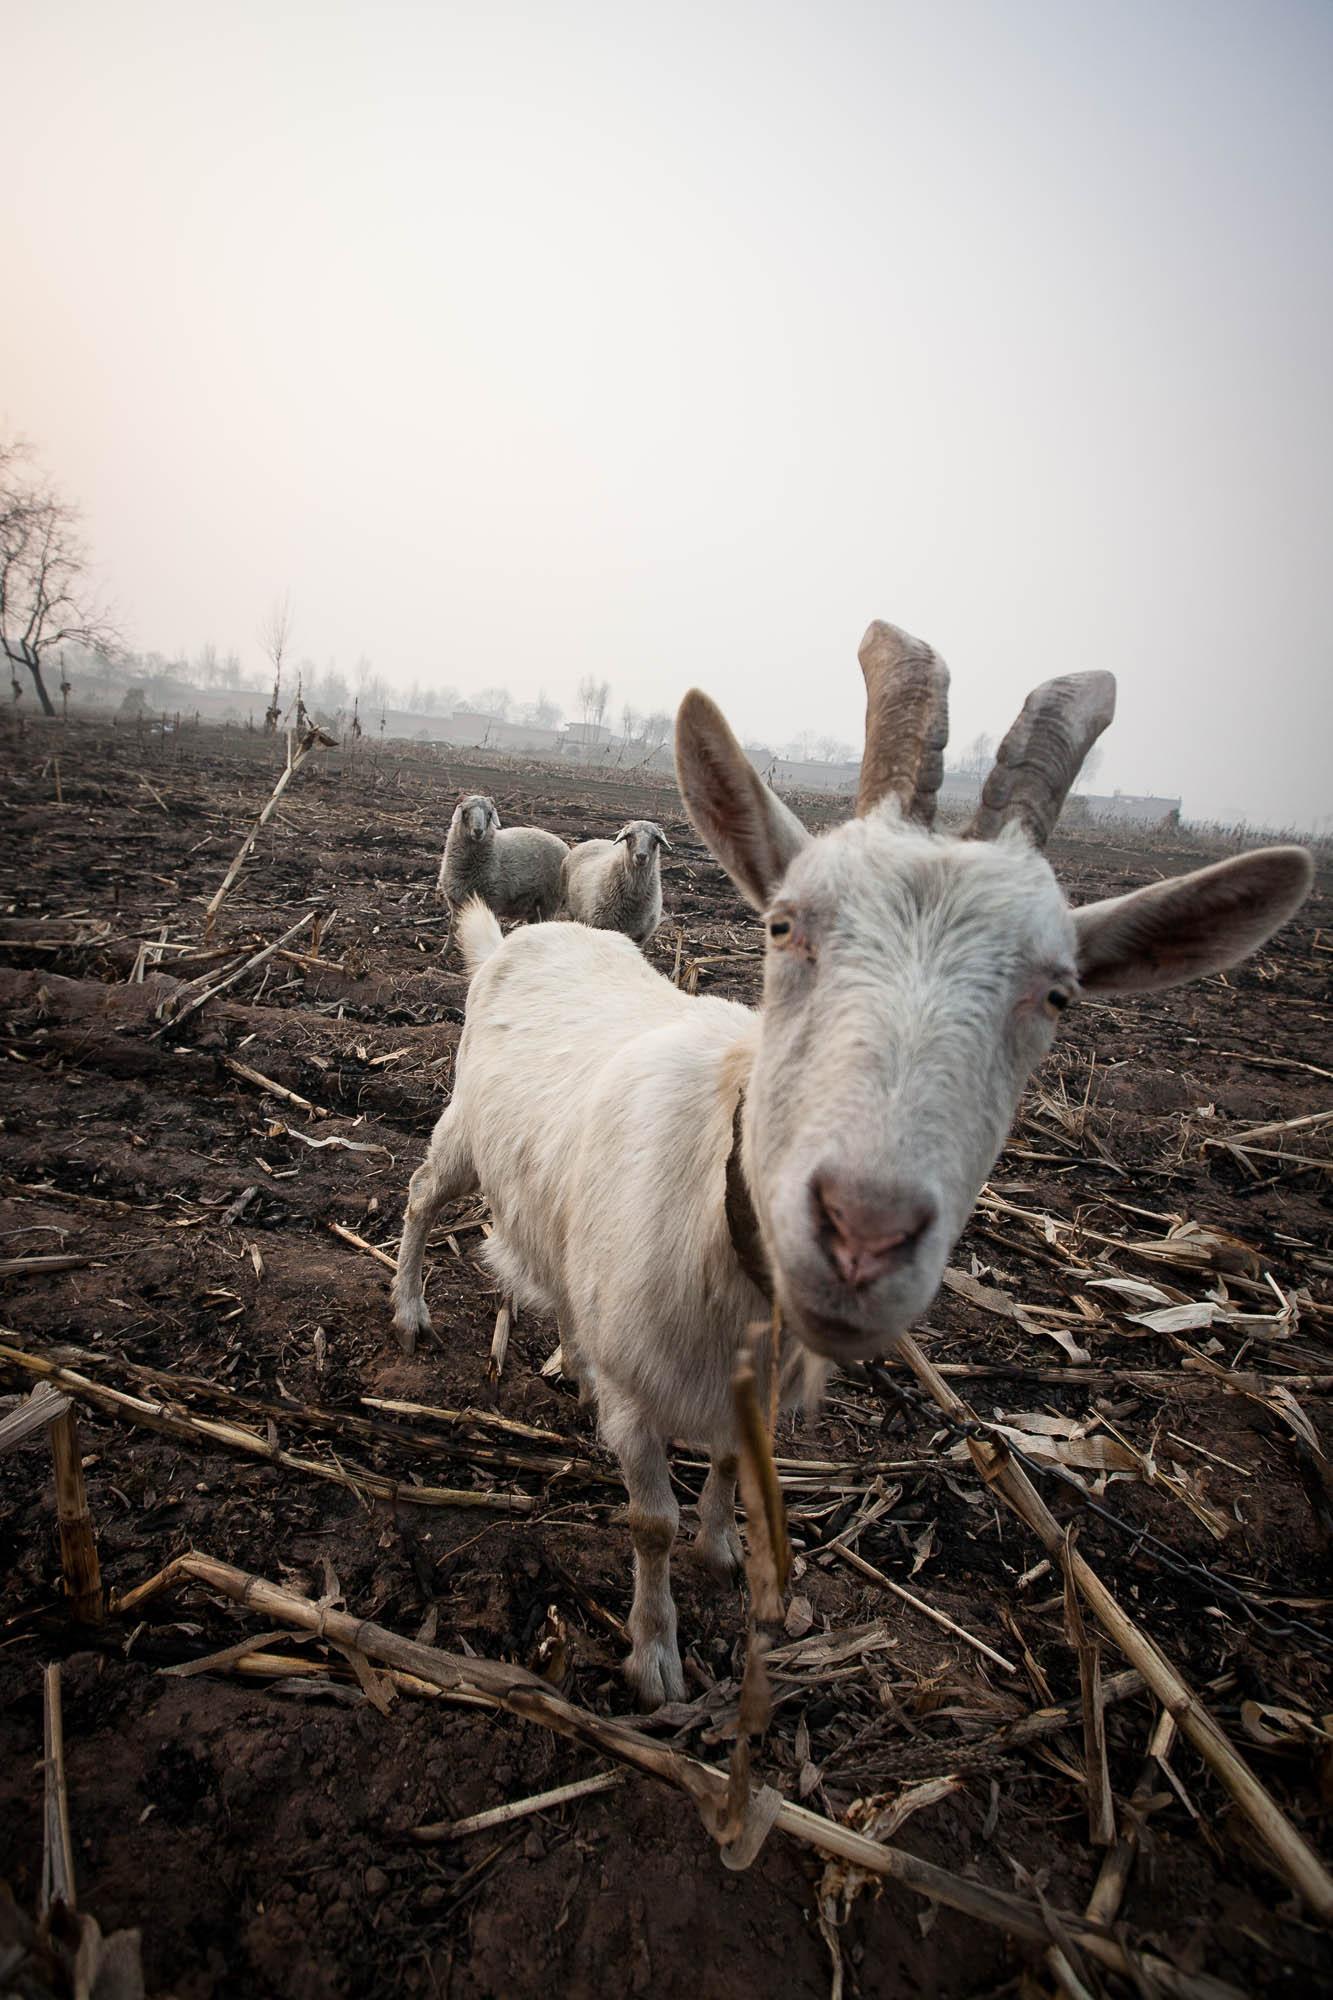 goat in Shanxi